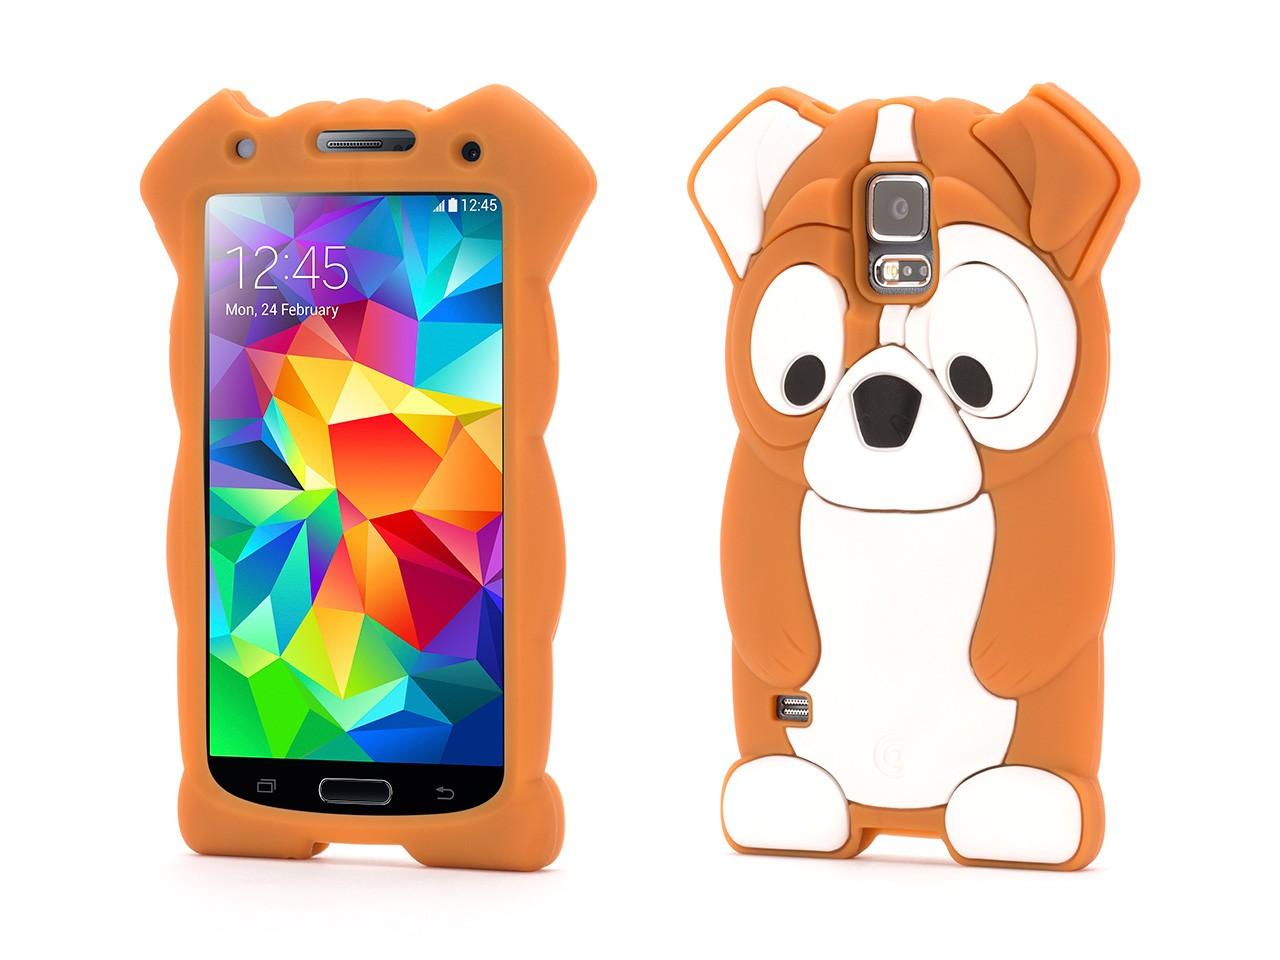 Samsung Galaxy S5 Protective Case KaZoo Protective Animal Case - Bull Dog